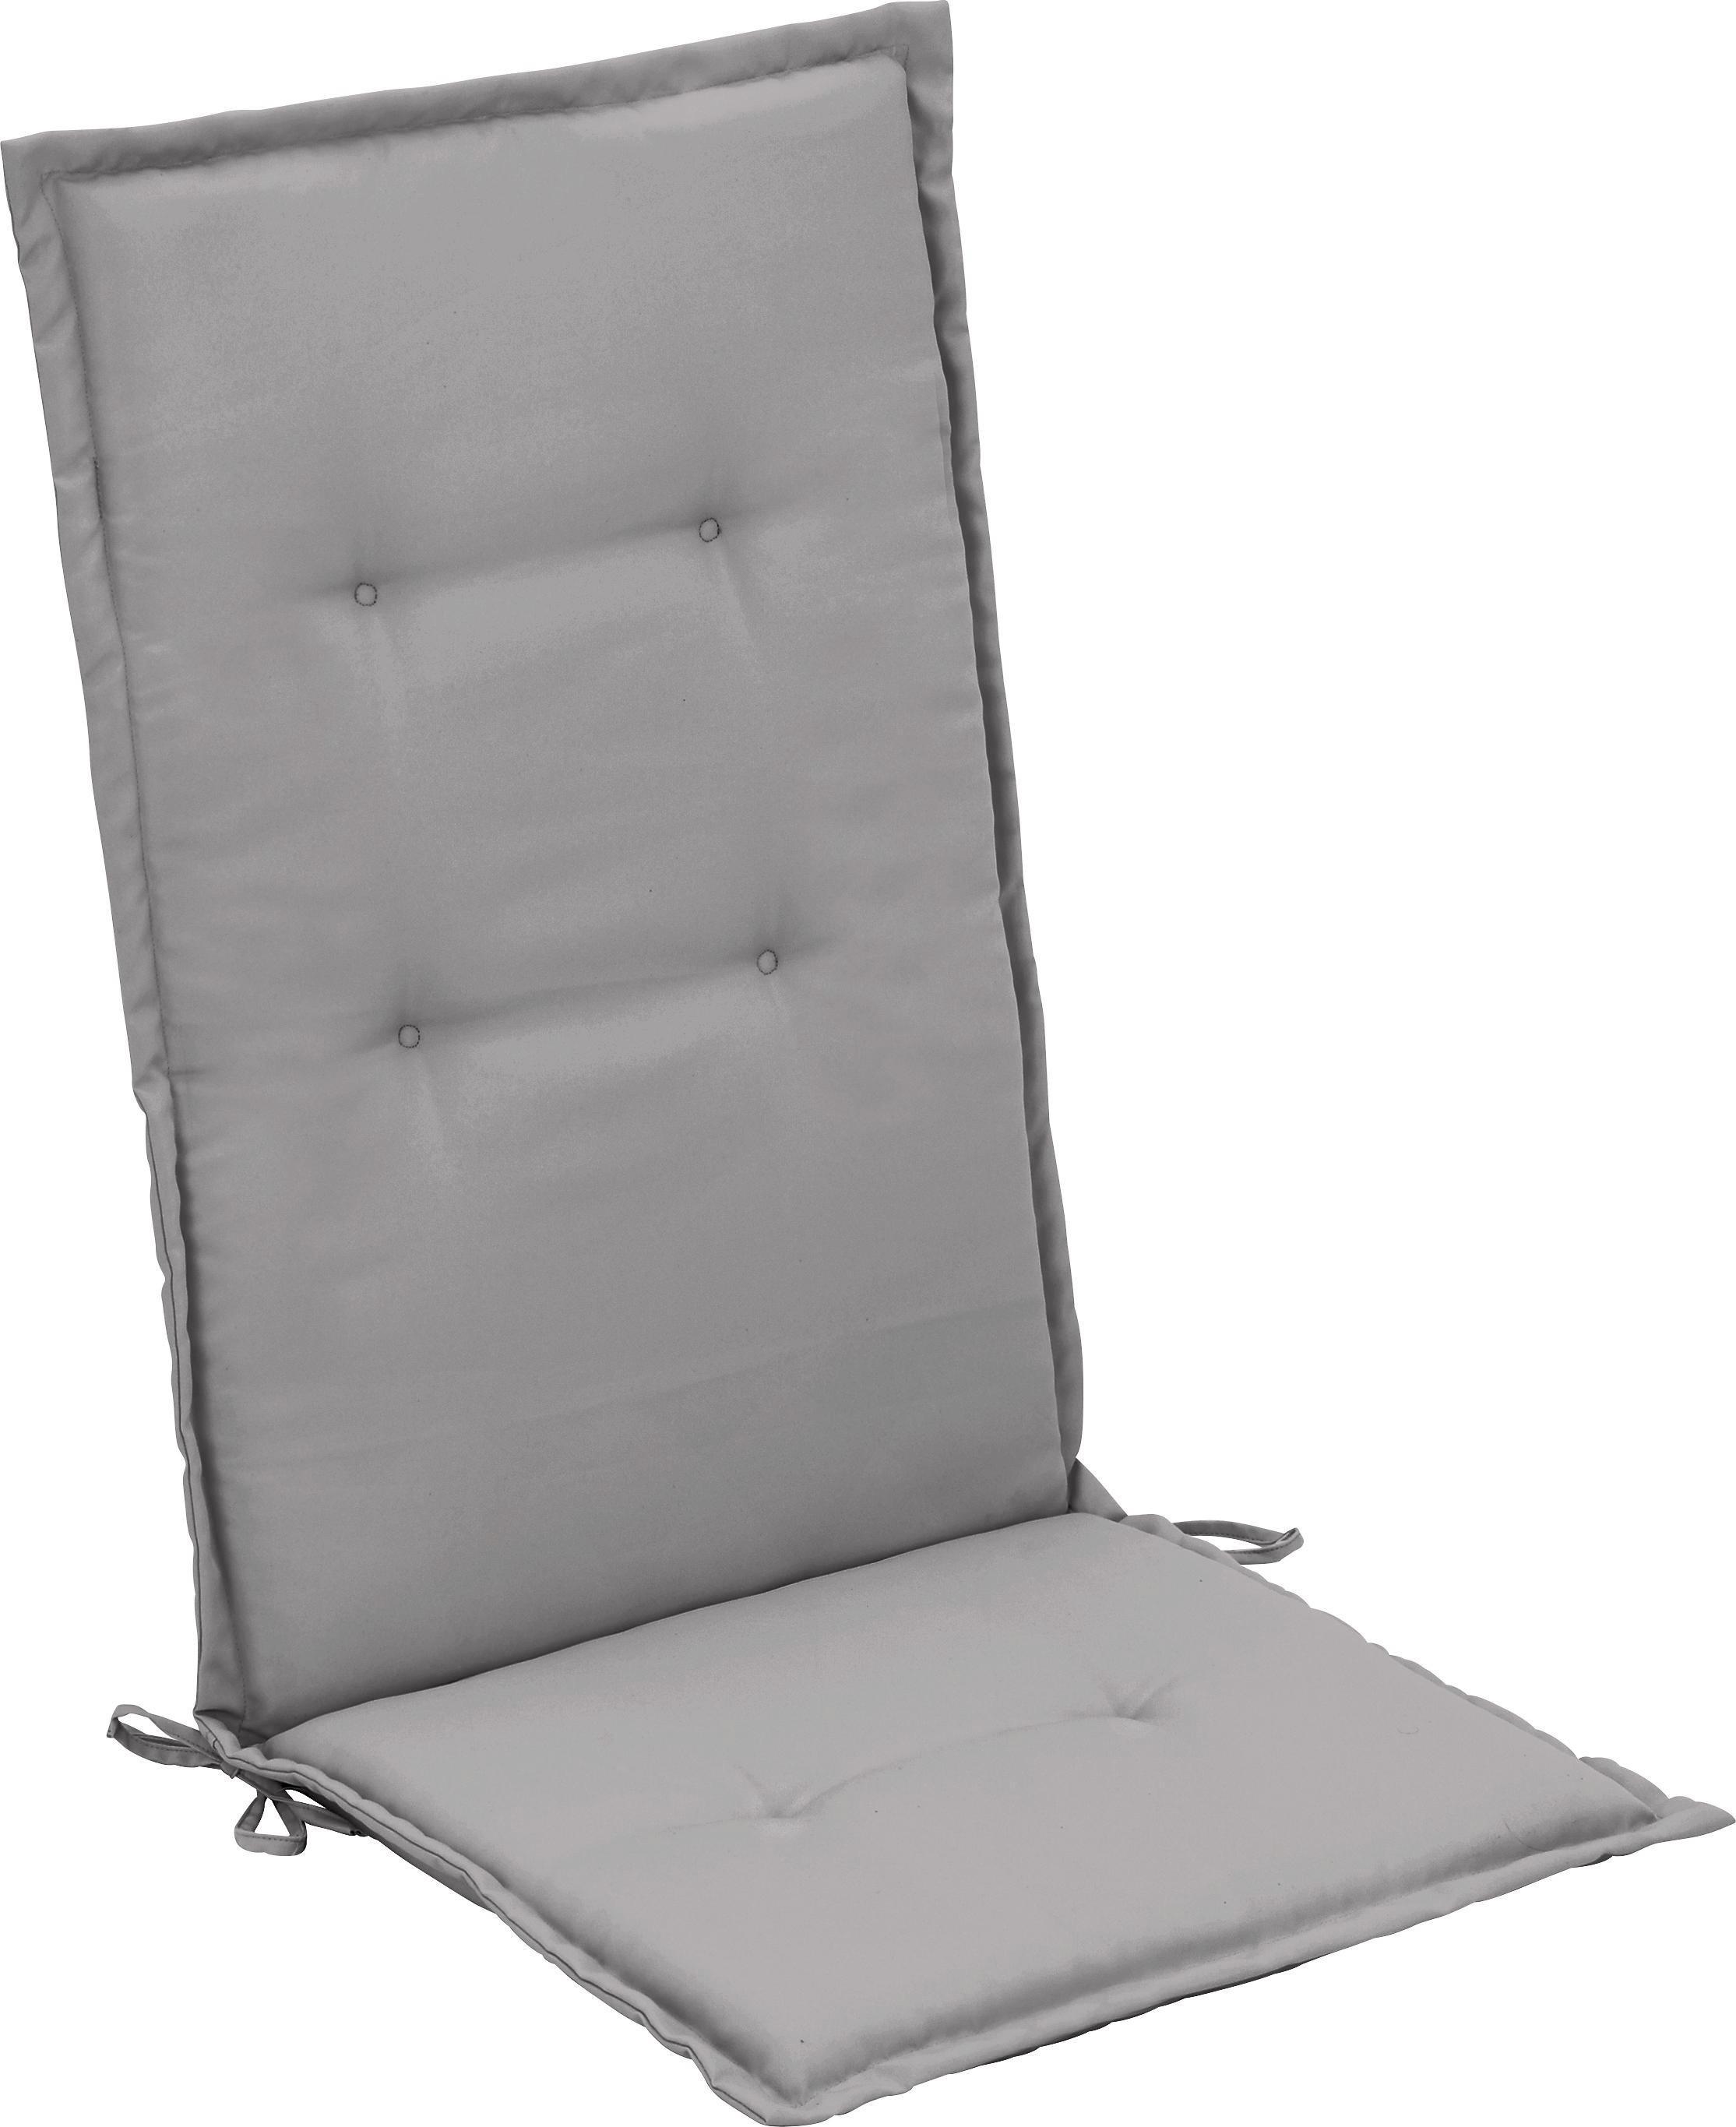 Sesselauflage Poppi in Hellgrau - Hellgrau, Textil (48/4/115cm) - MÖMAX modern living